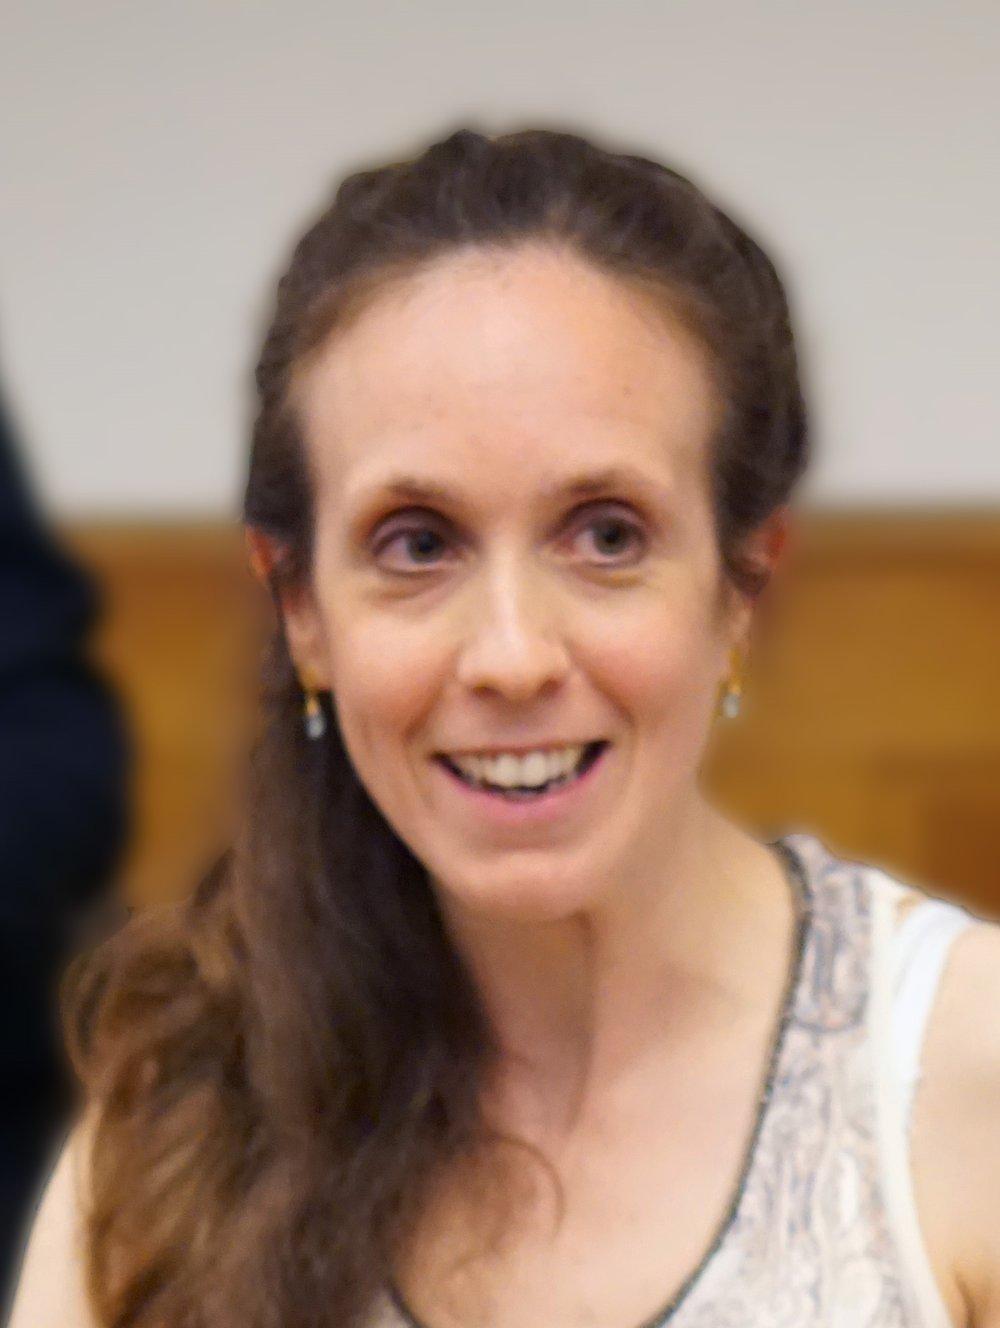 Nicole Schnackenberg